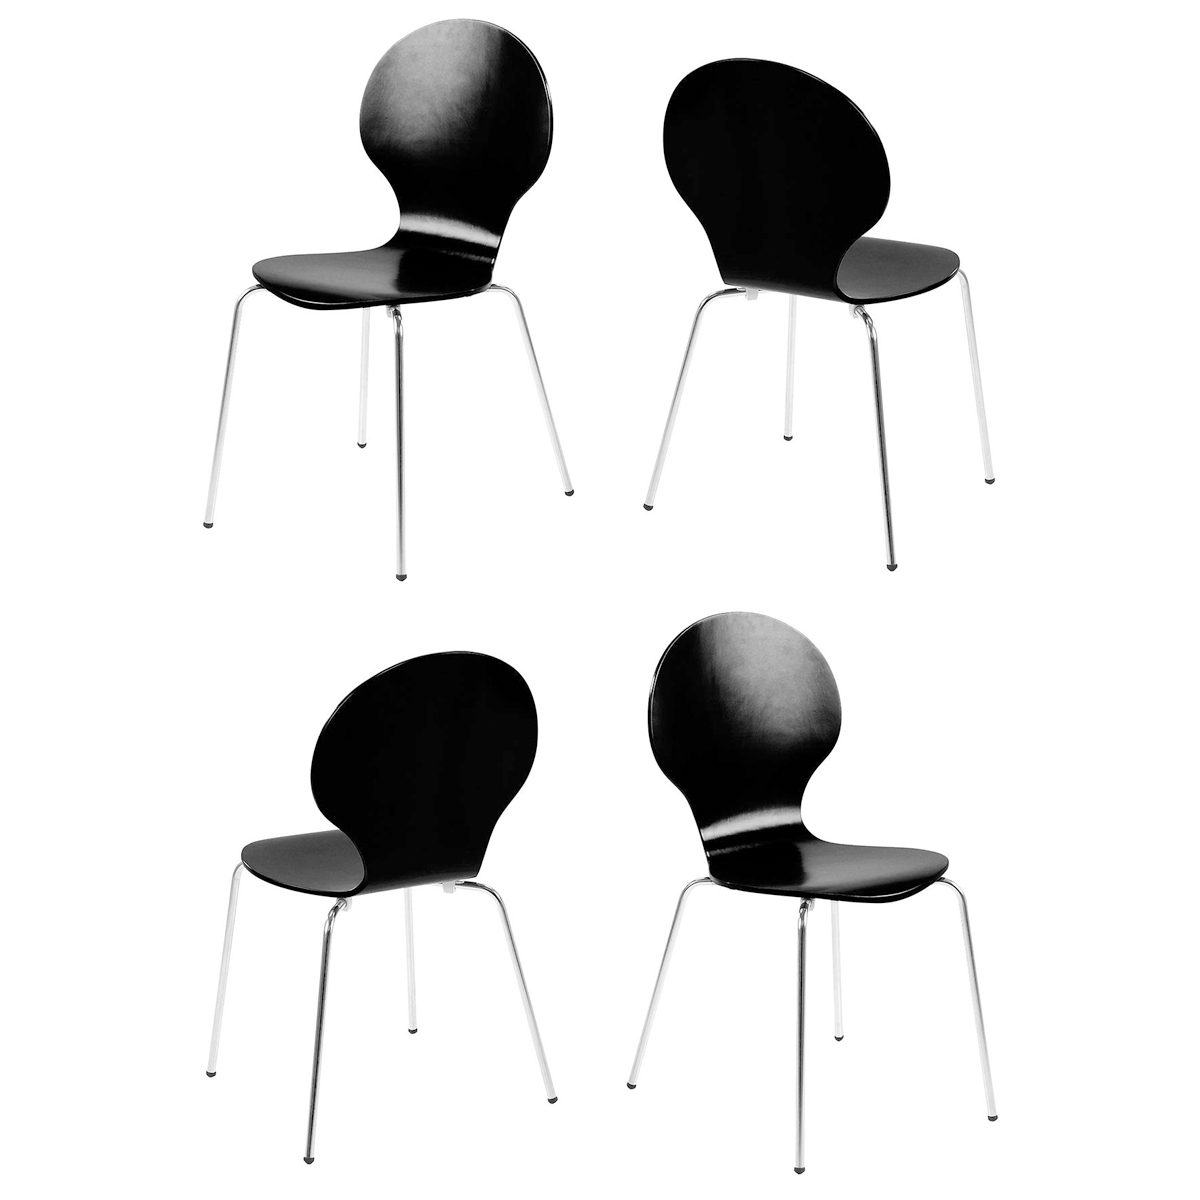 Stuhl marcus 4er set stapelstuhl esszimmer konferenzstuhl for Stuhl schwarz esszimmer